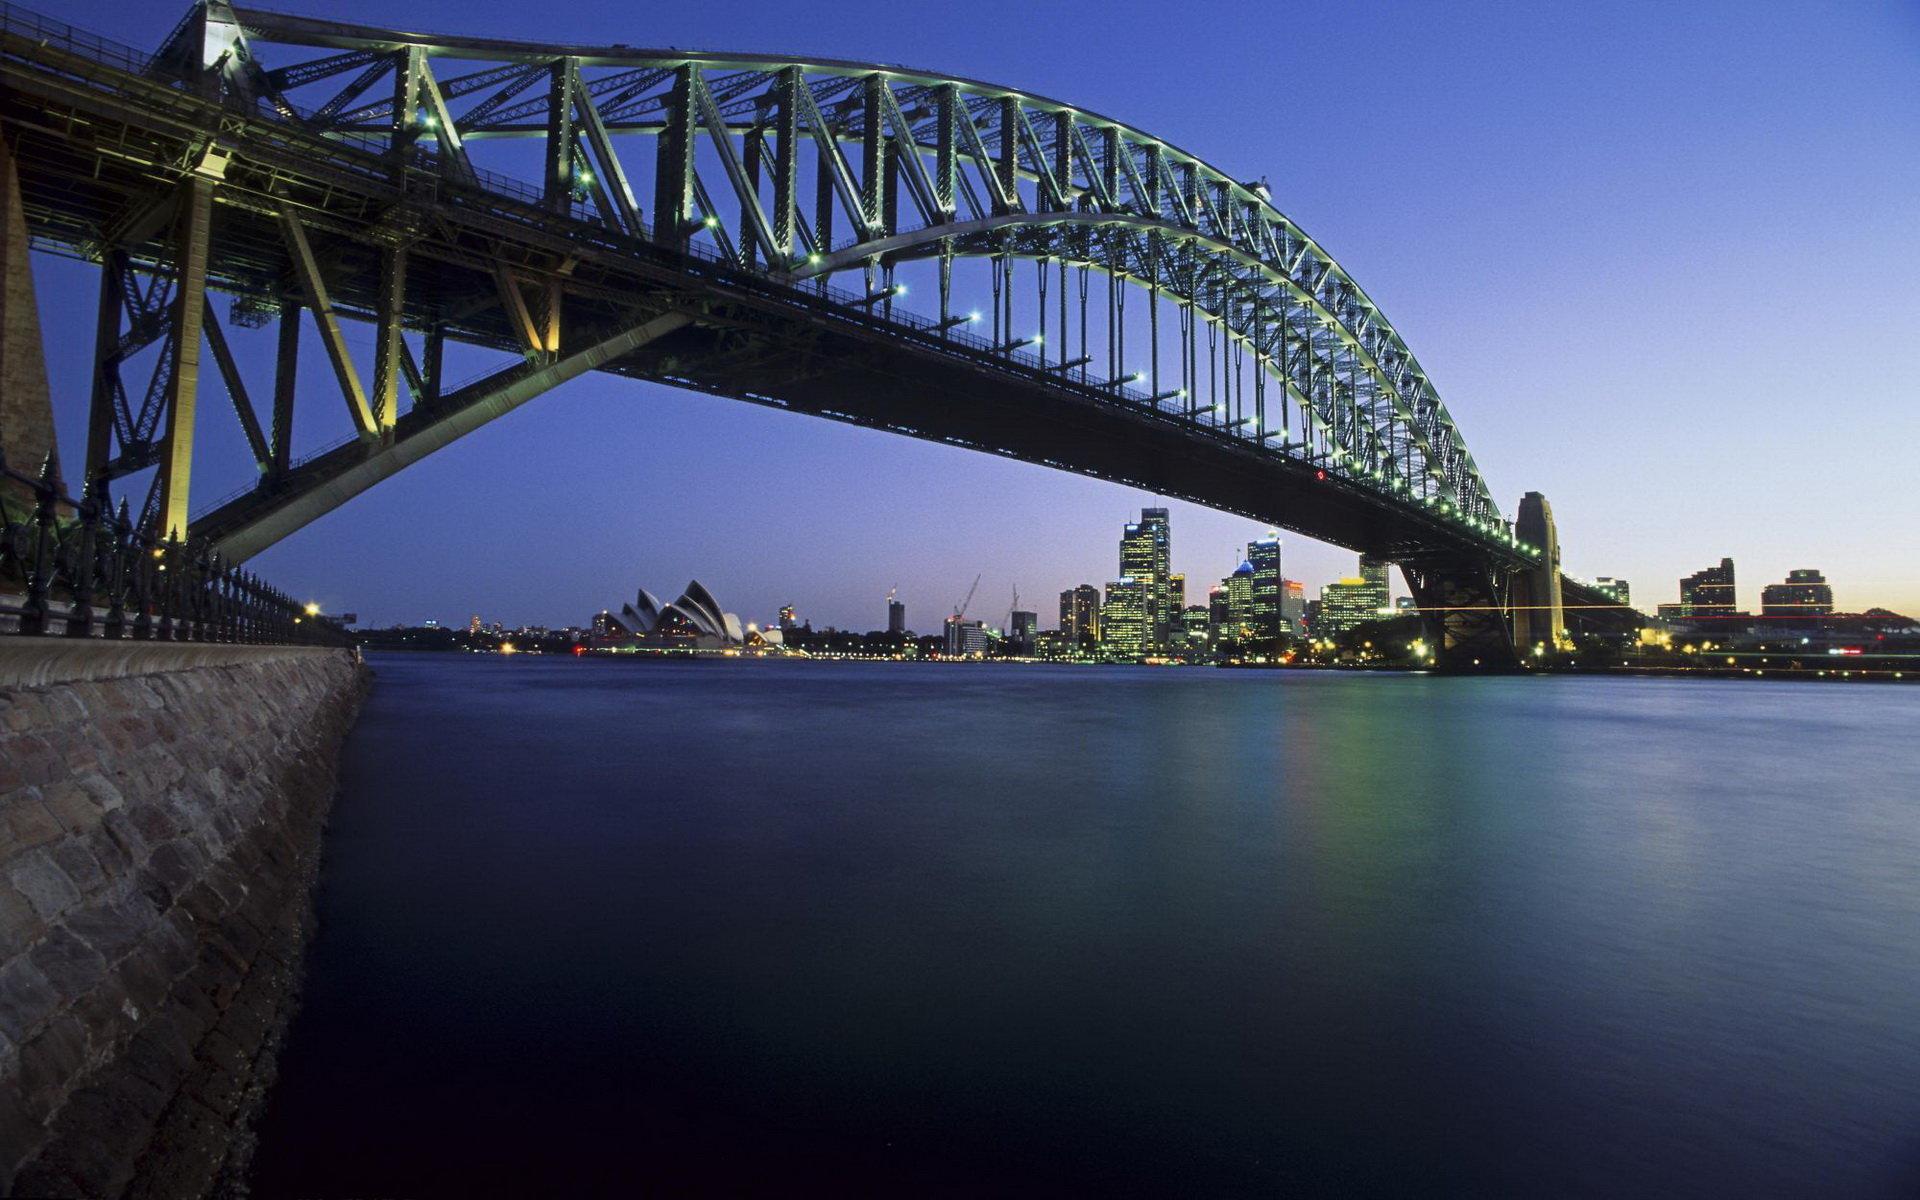 Sydney Harbour Bridge Wallpapers Hd For Desktop Backgrounds